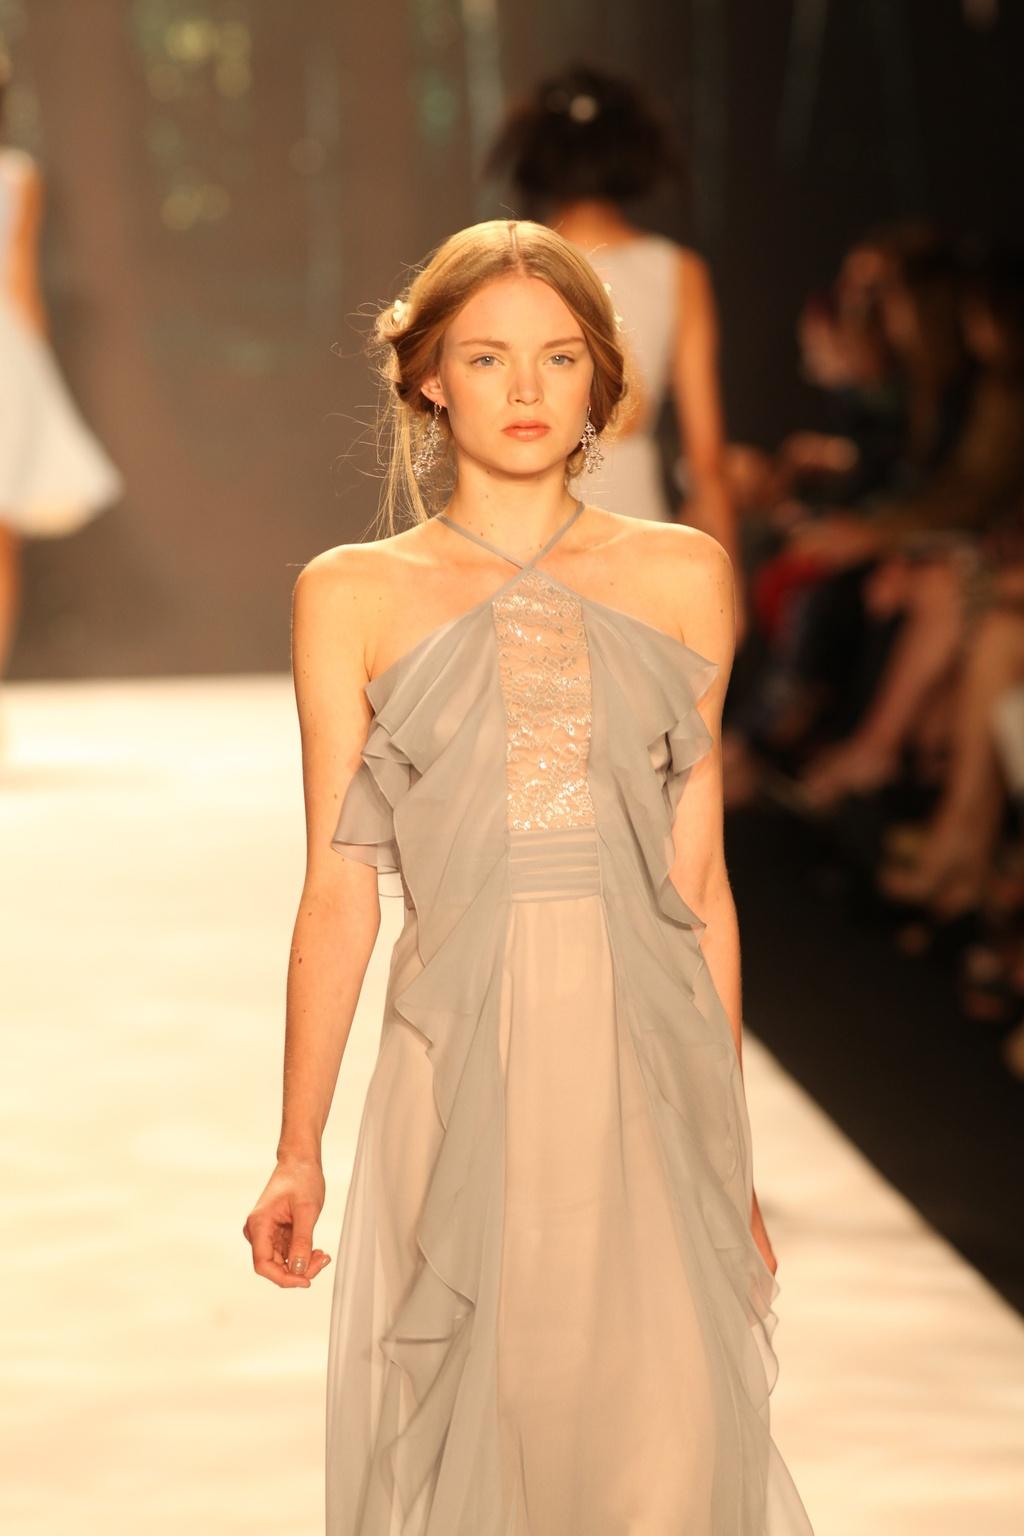 Wedding-hair-inspiration-badgley-mischka-bridal-updos-3.full